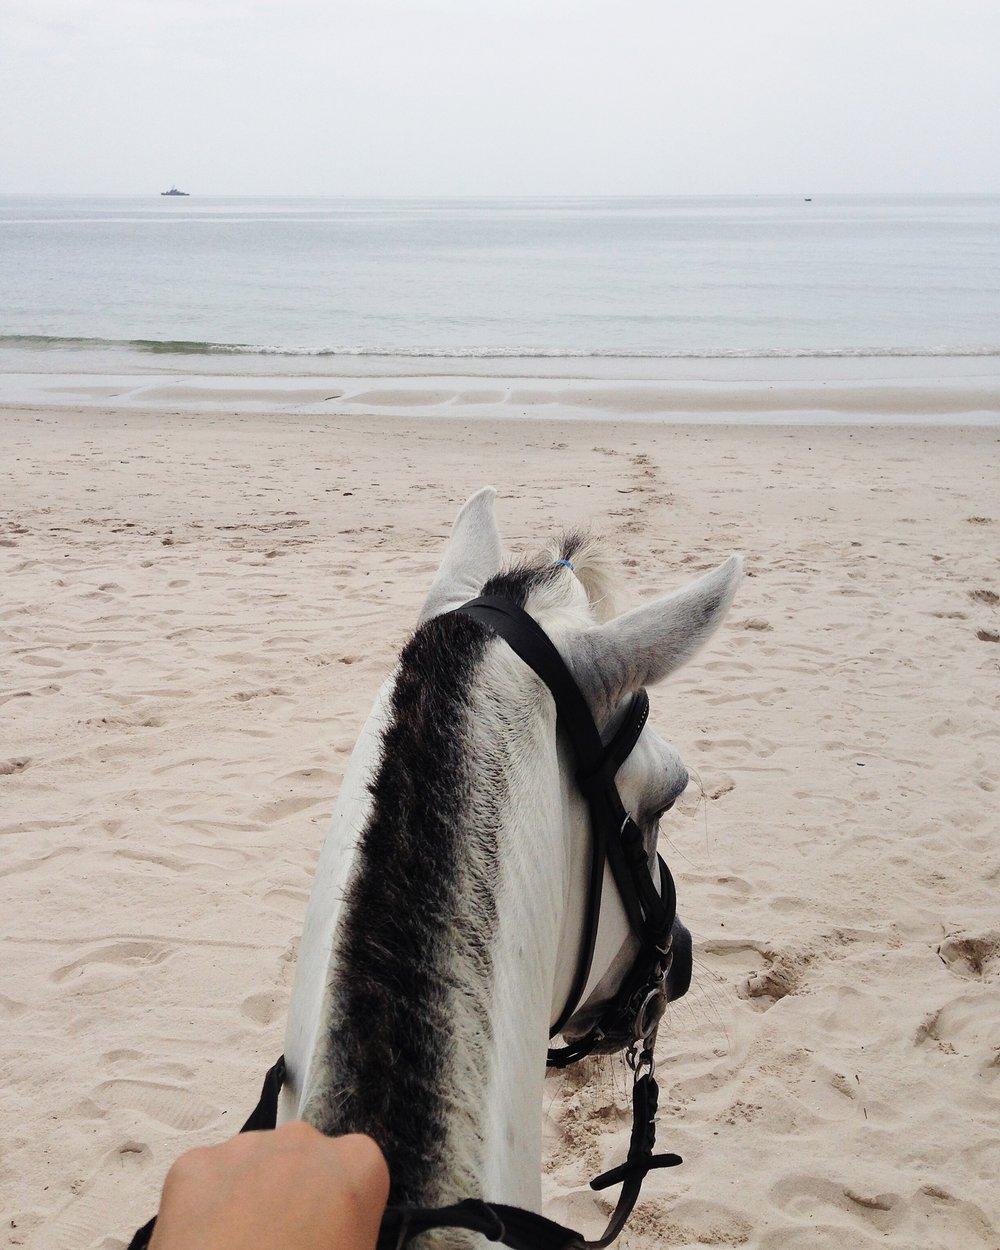 POV horse by a social media photographer